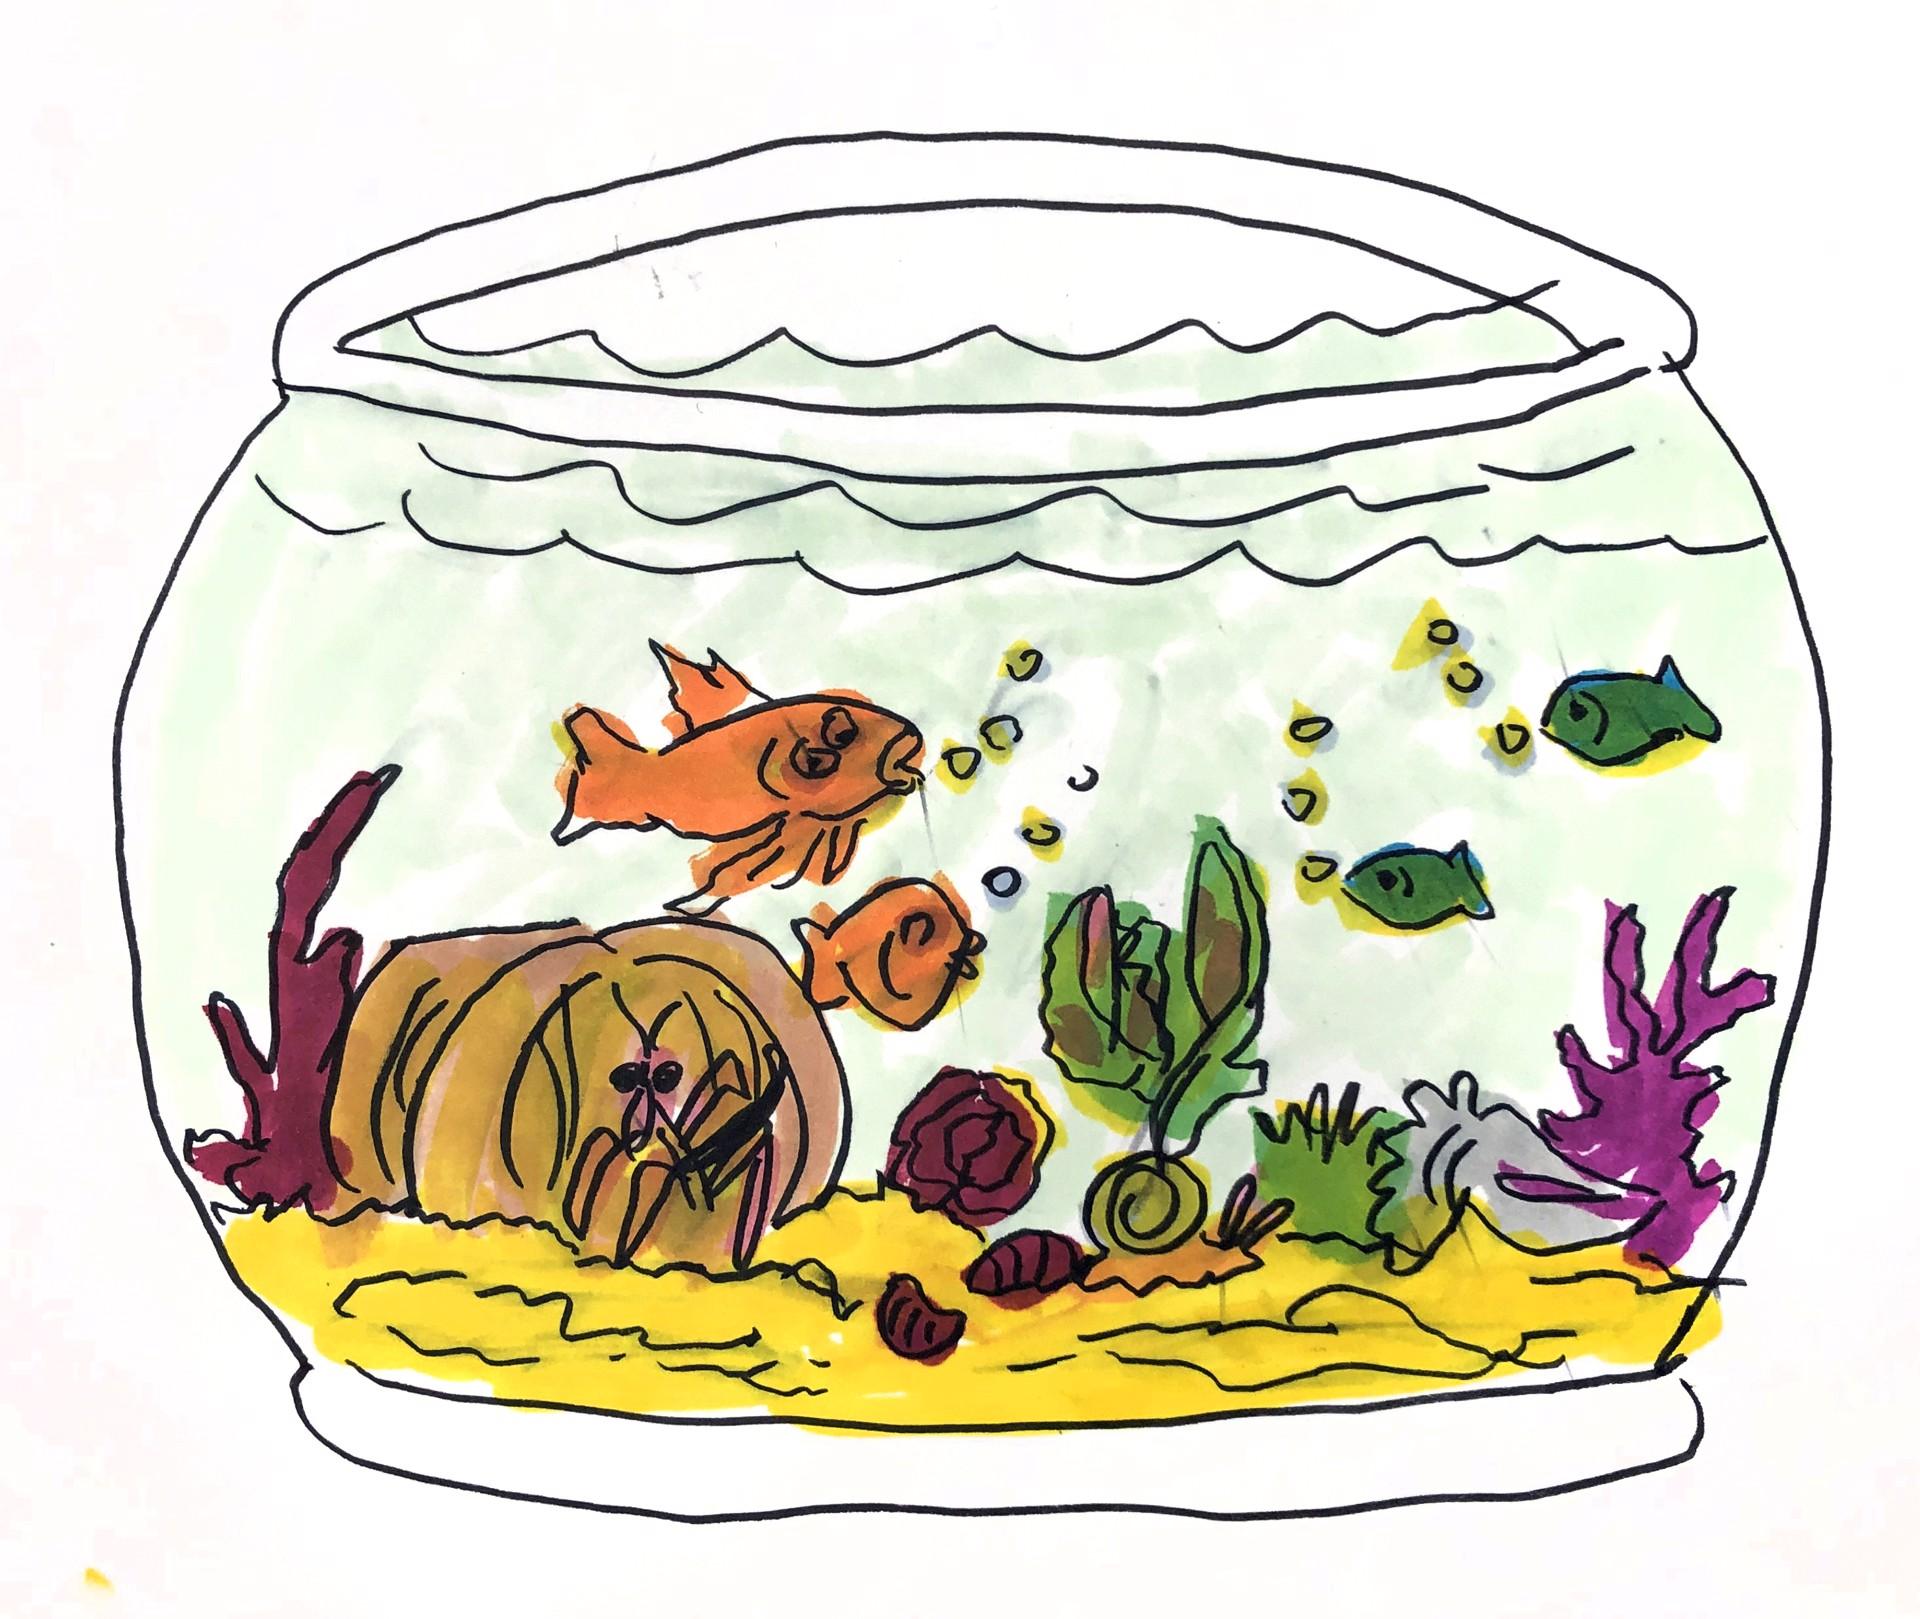 Fishbowl by Nonja Tiller